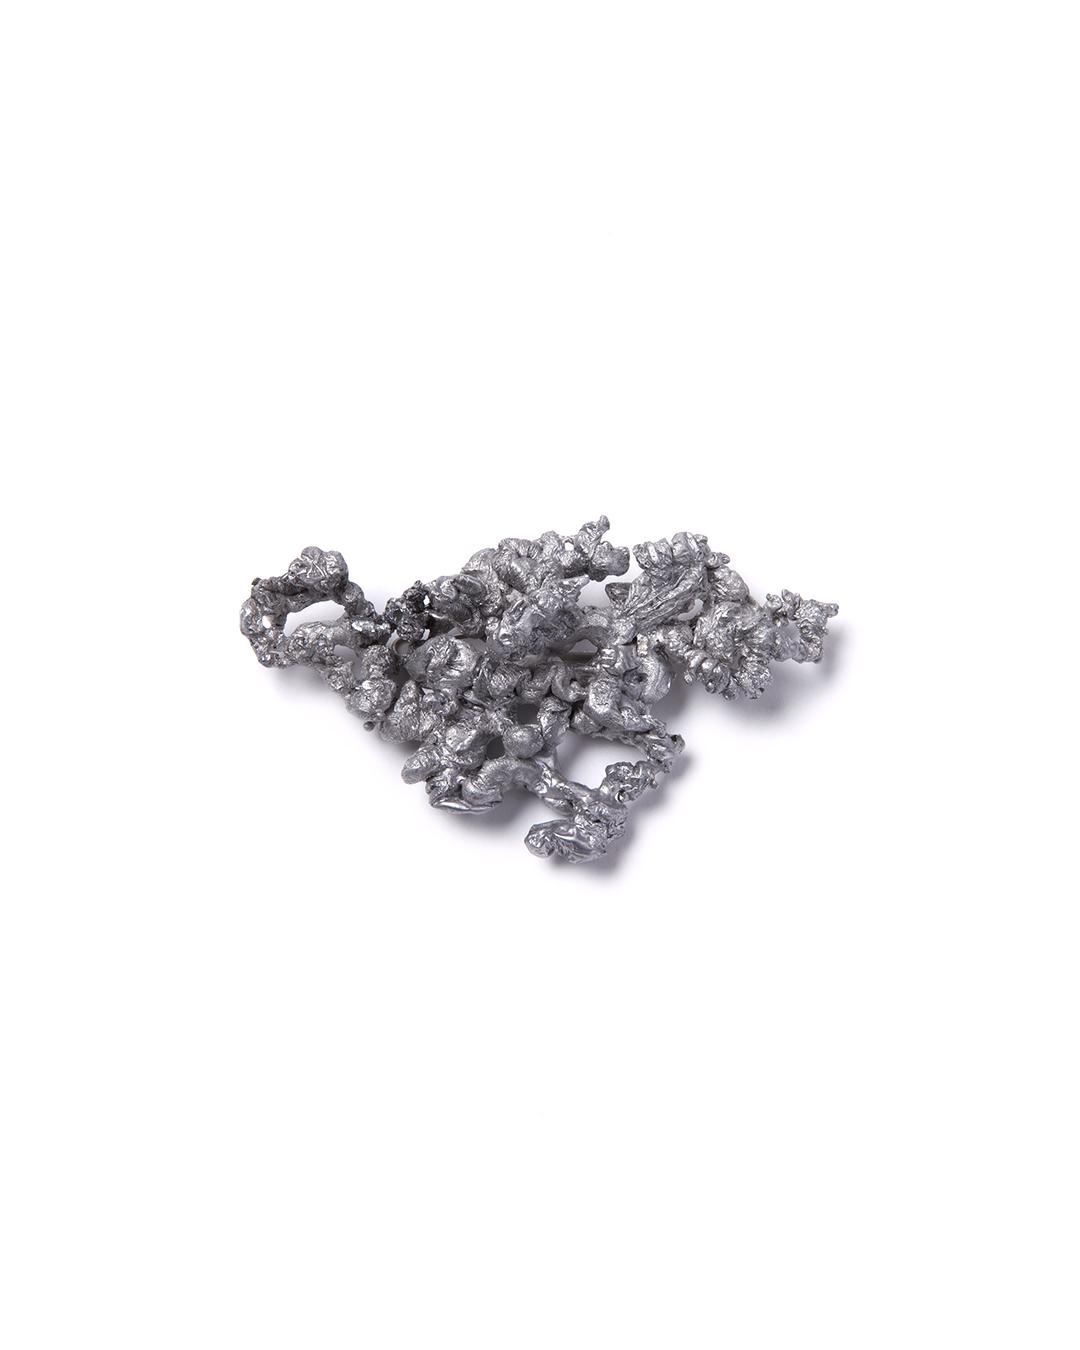 Barbara Schrobenhauser, Drawn to it II, 2015, brooch; aluminium, stainless steel, 85 x 48 x 23 mm, €585